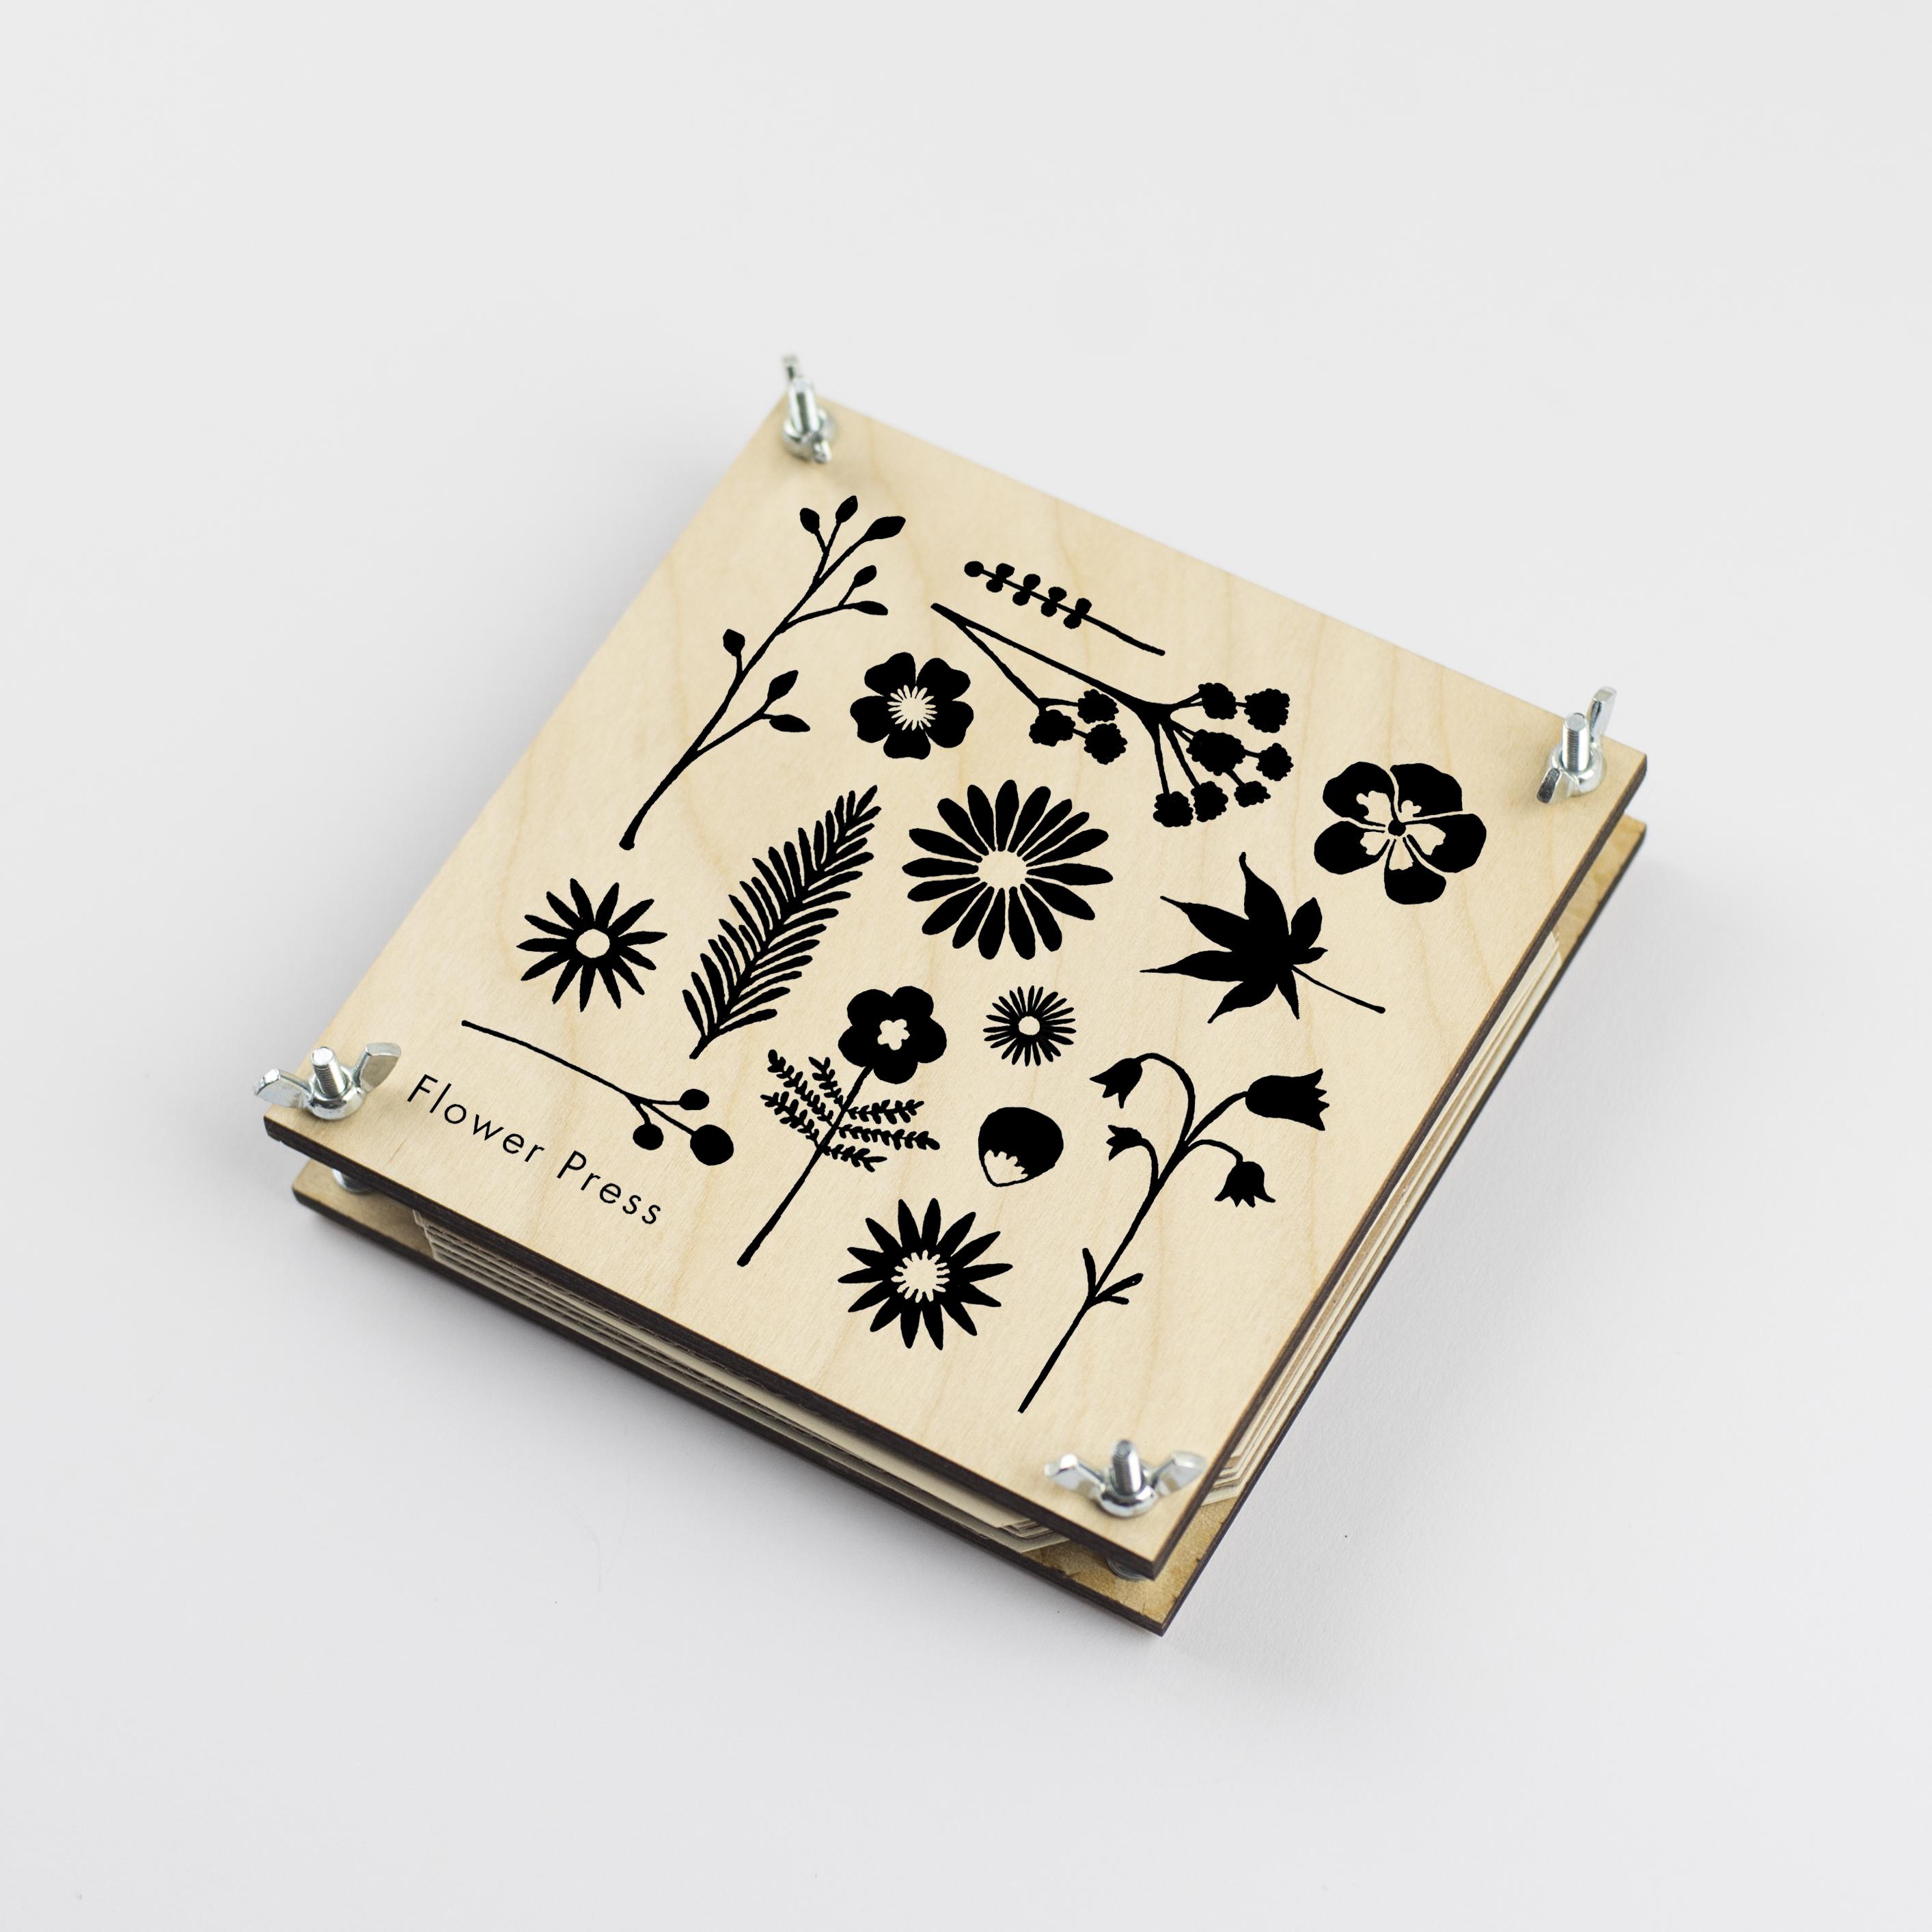 Flower press - Silhouette